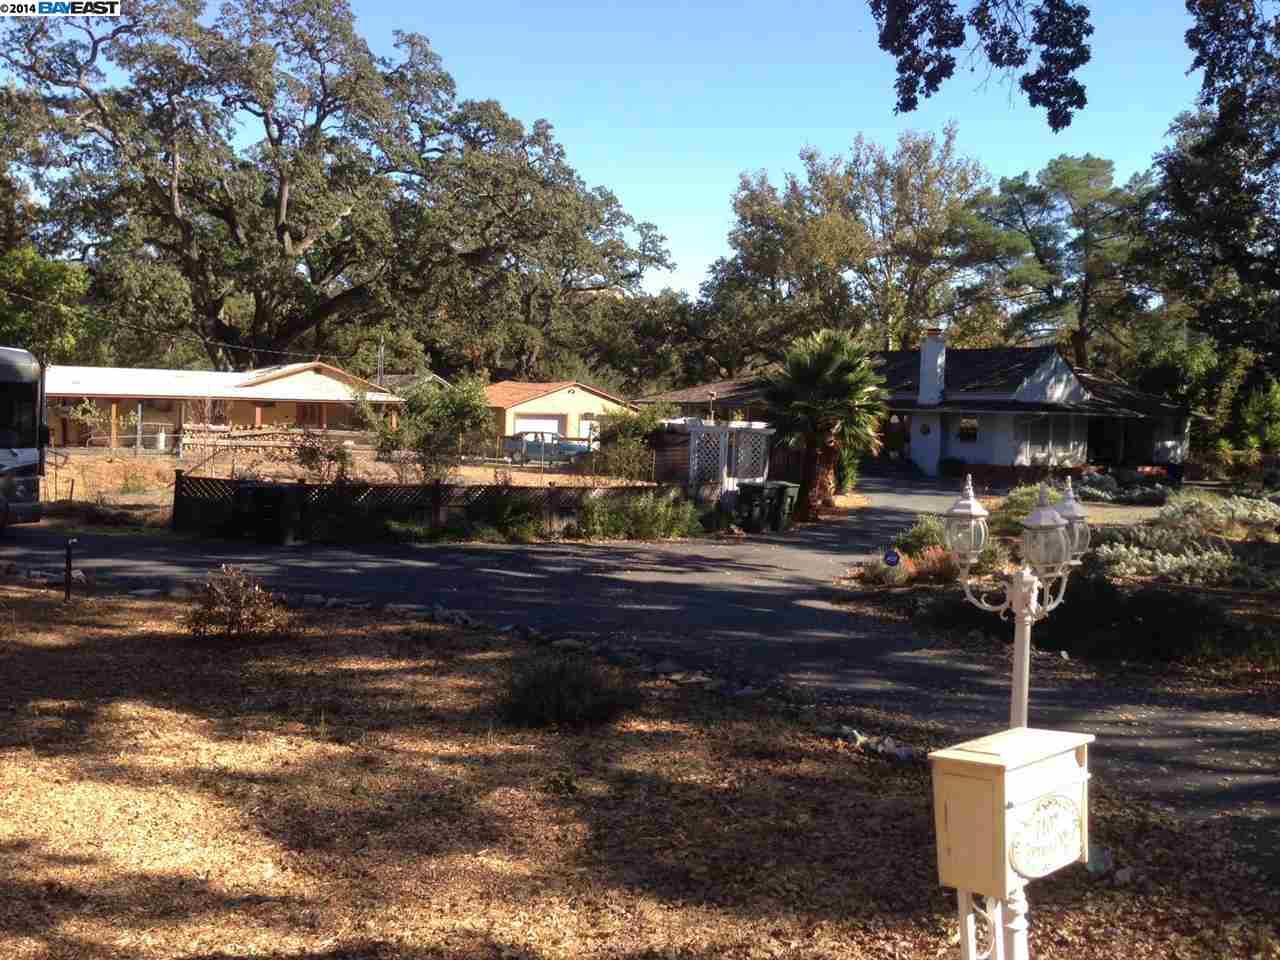 Real Estate for Sale, ListingId: 31159053, Pleasanton,CA94566